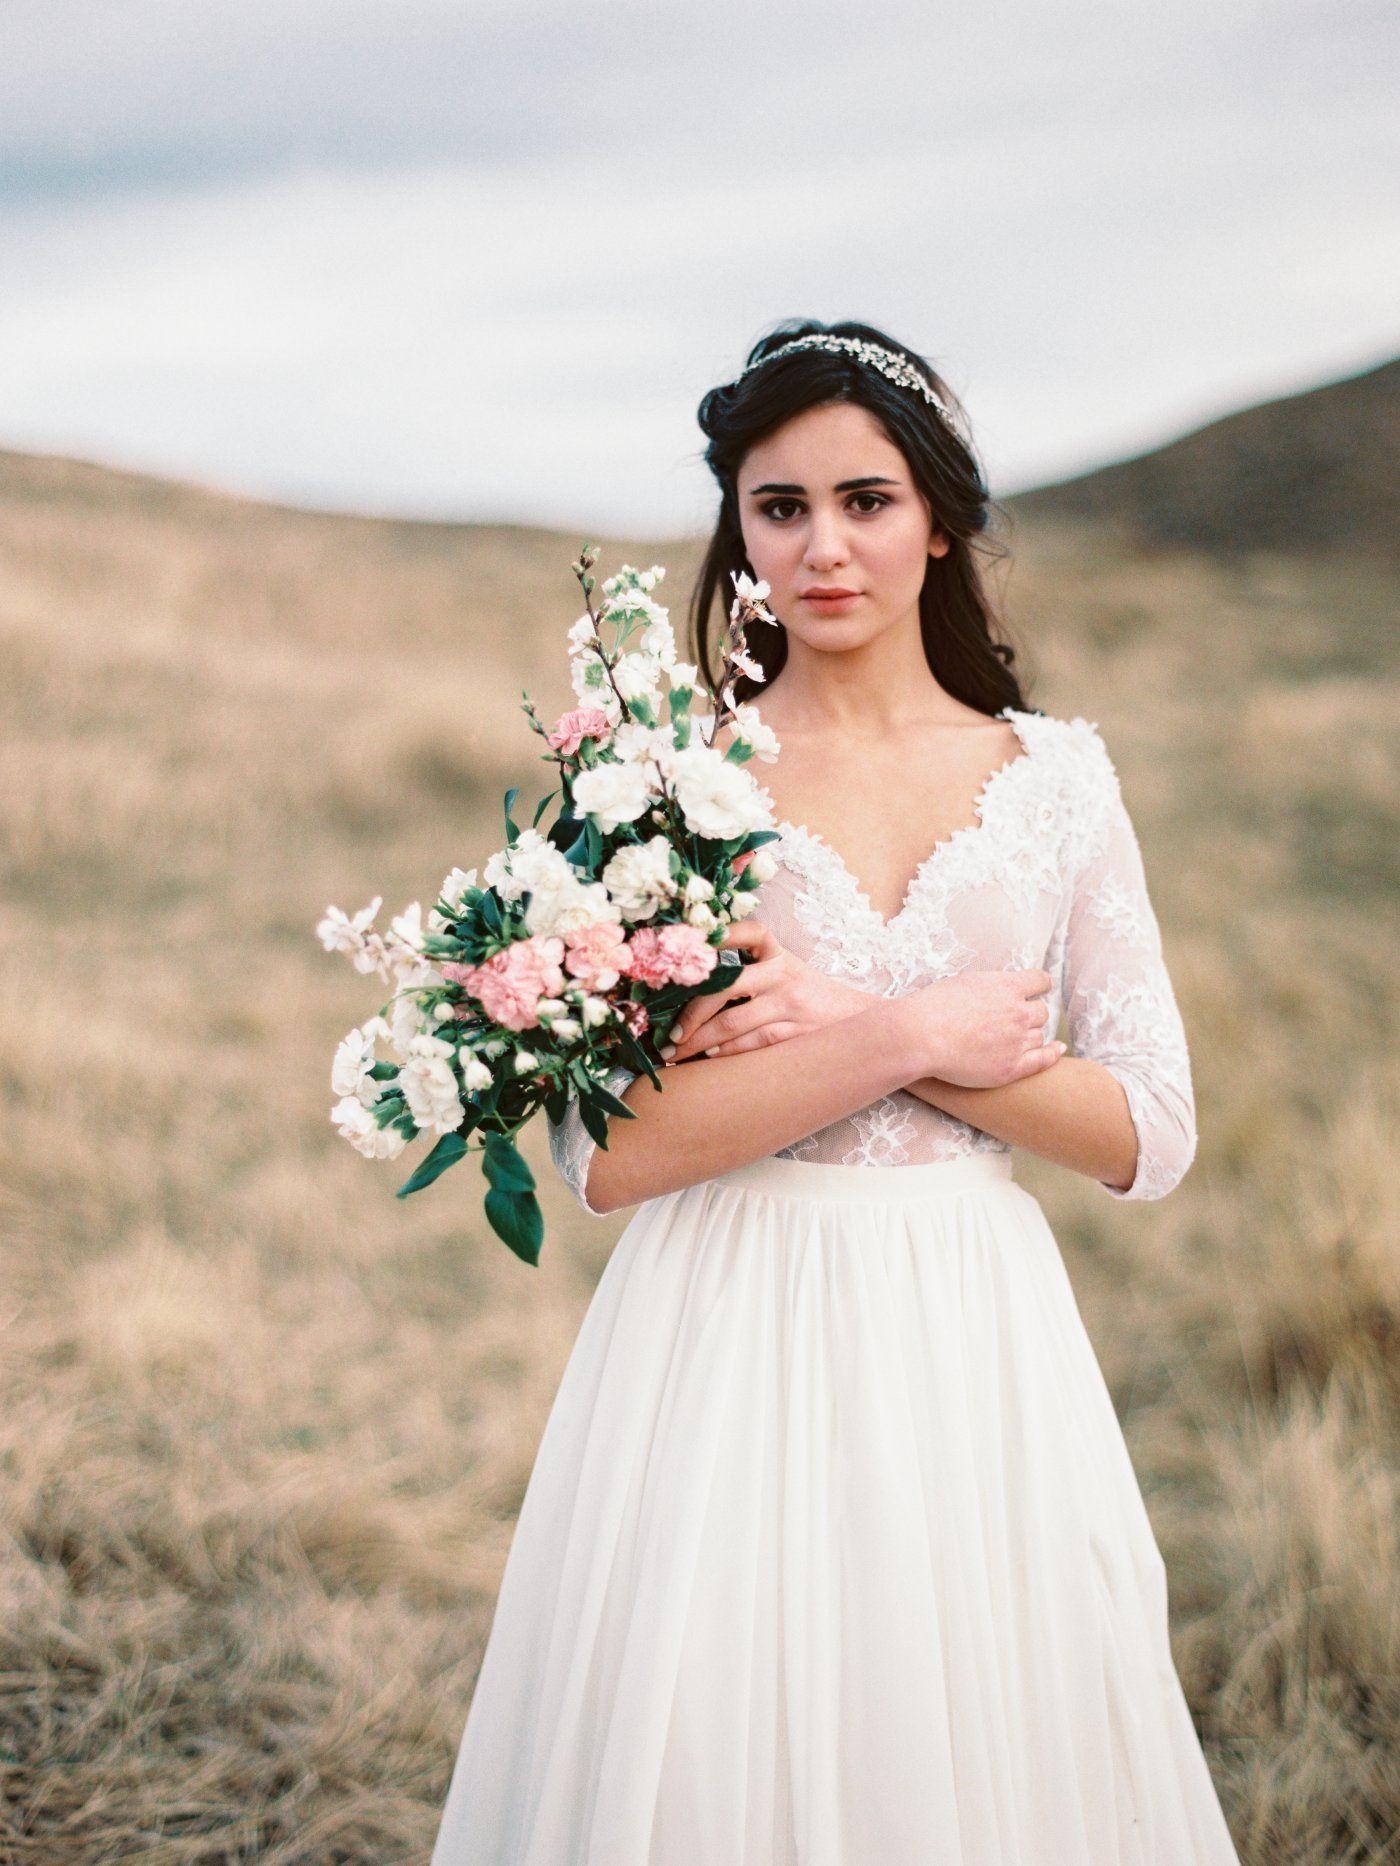 Royal themed wedding dresses  TamaraGigolaphotographyCathytelleroyalweddingdresskakheti